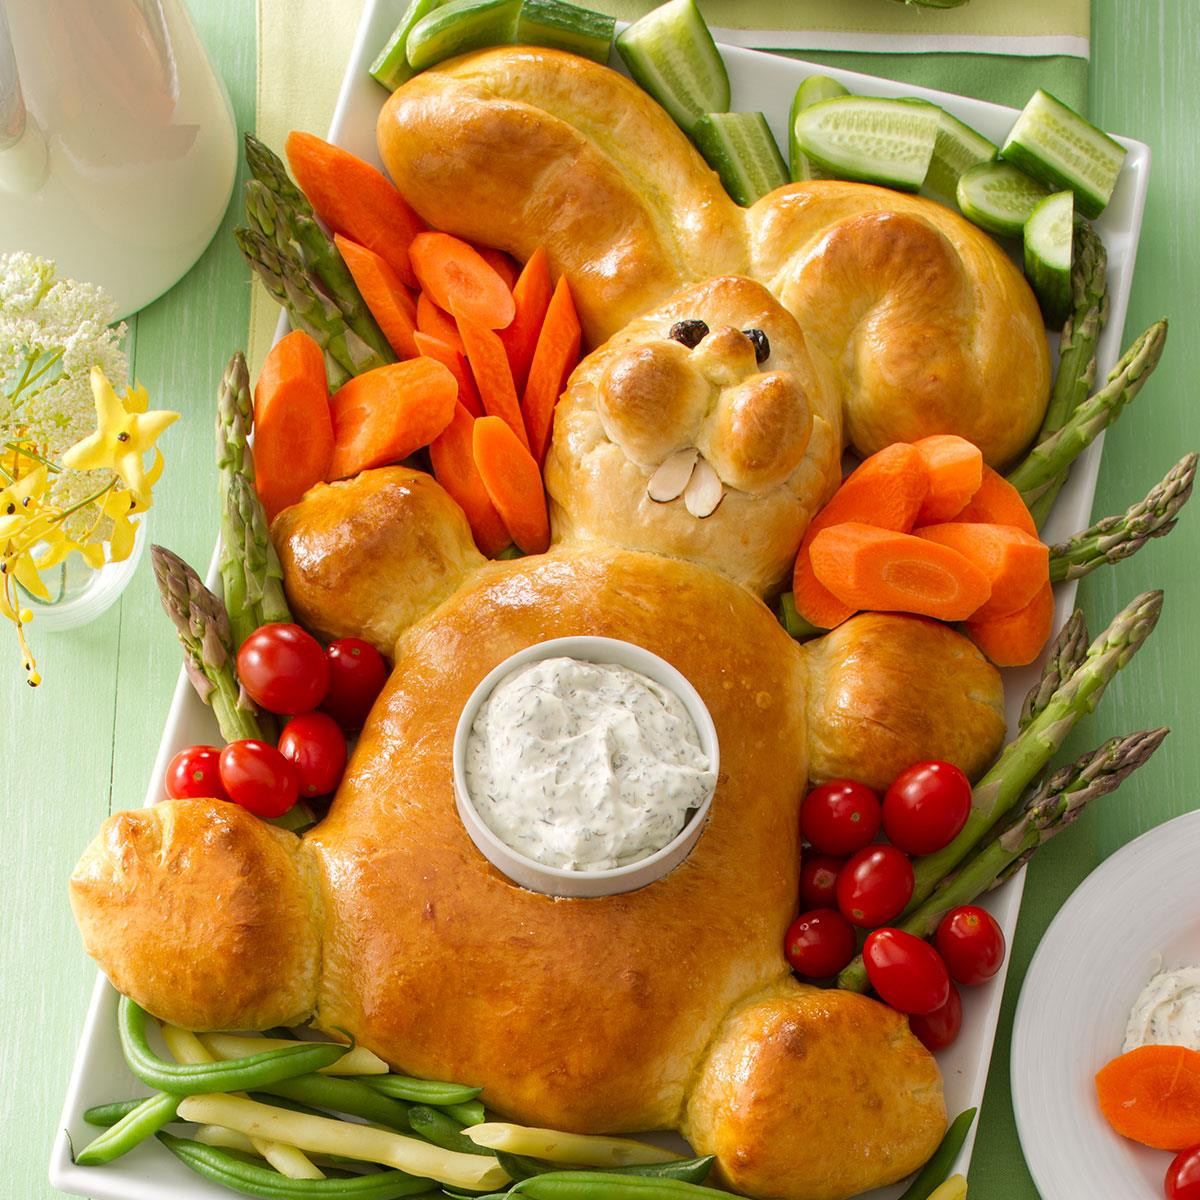 Allrecipes Easter Dinner  14 Easter Bunny Shaped Recipes